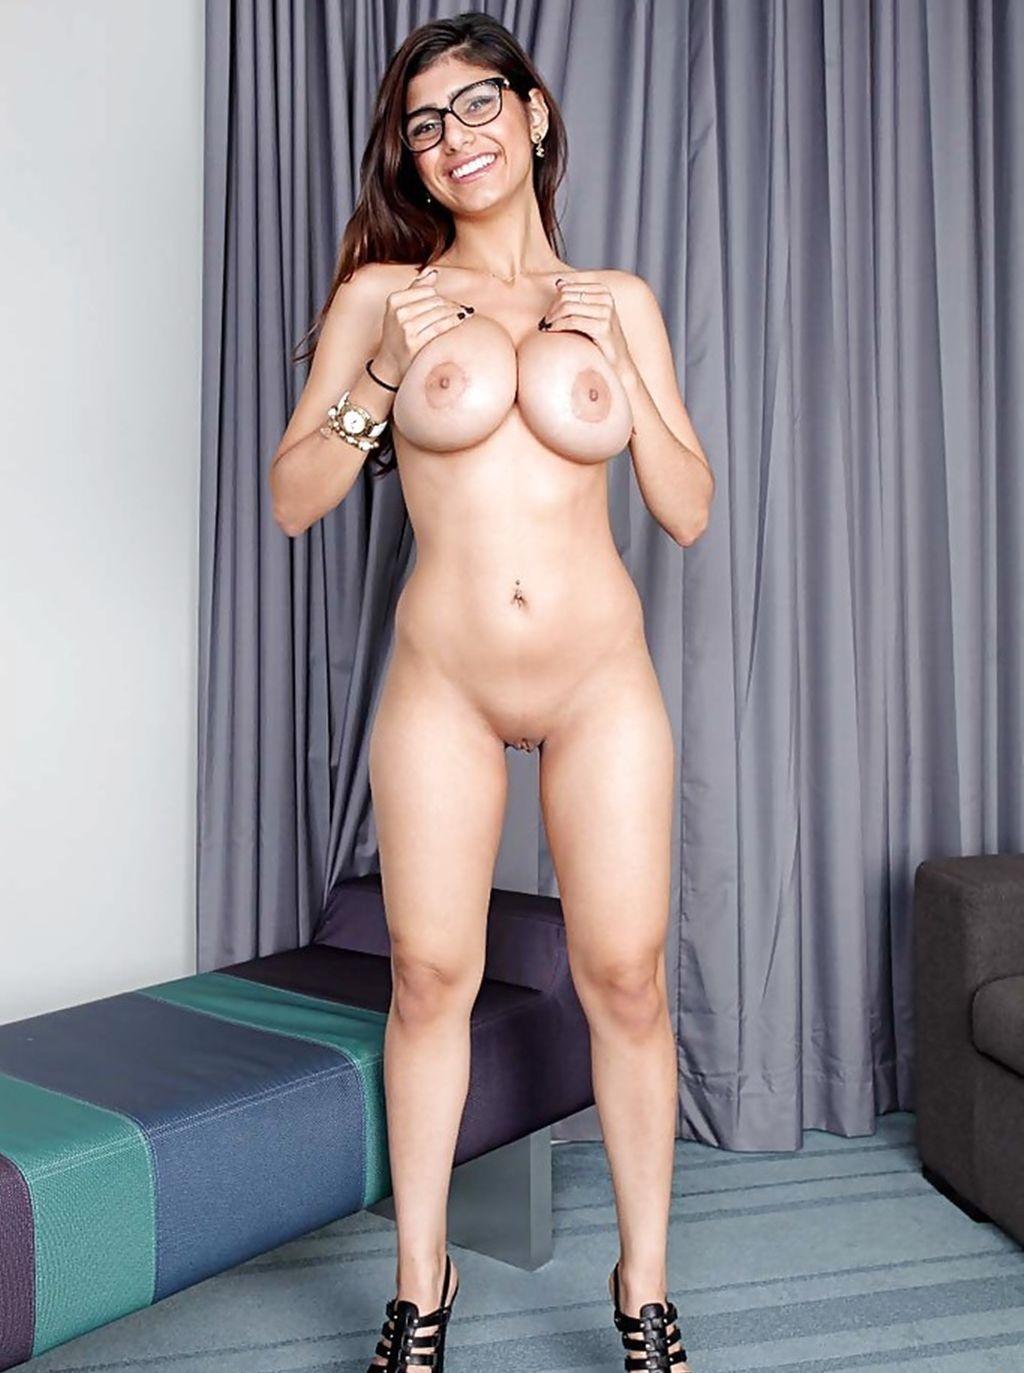 Fotos nuas Mia Khalifa pelada